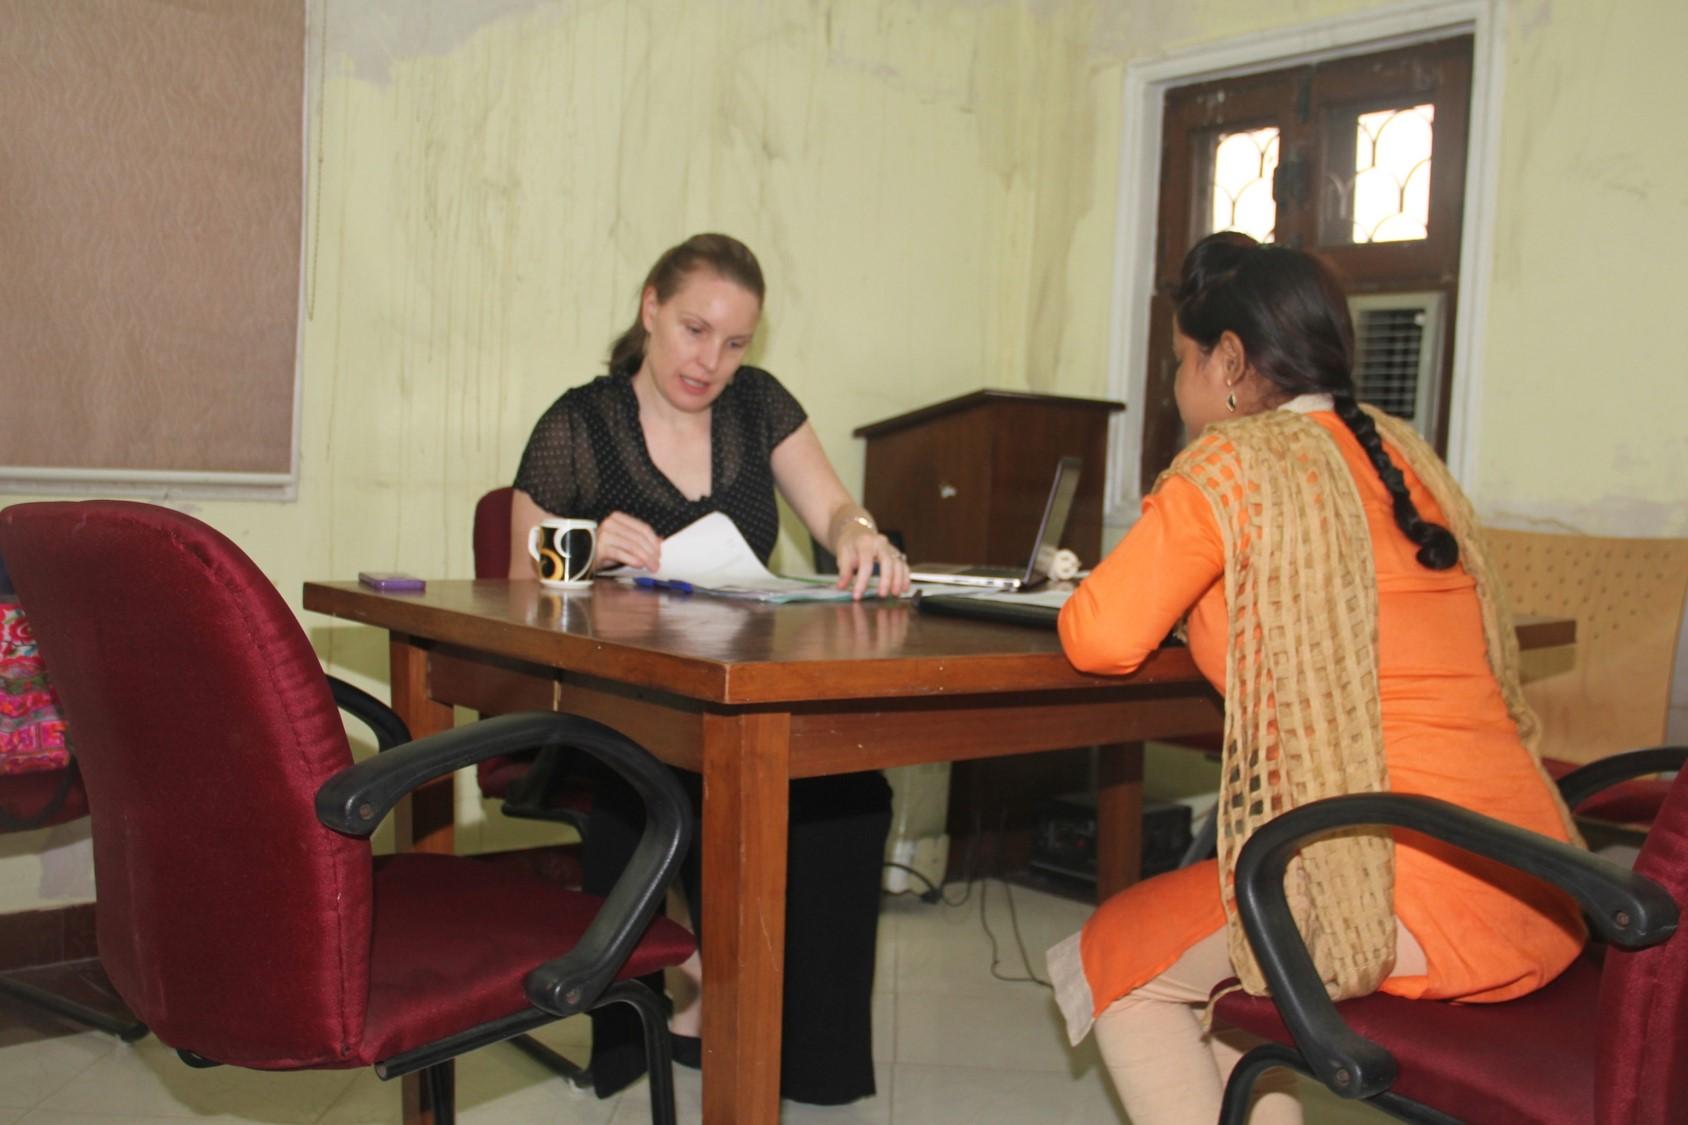 Asha Volunteer, Kimberley conducting the interview